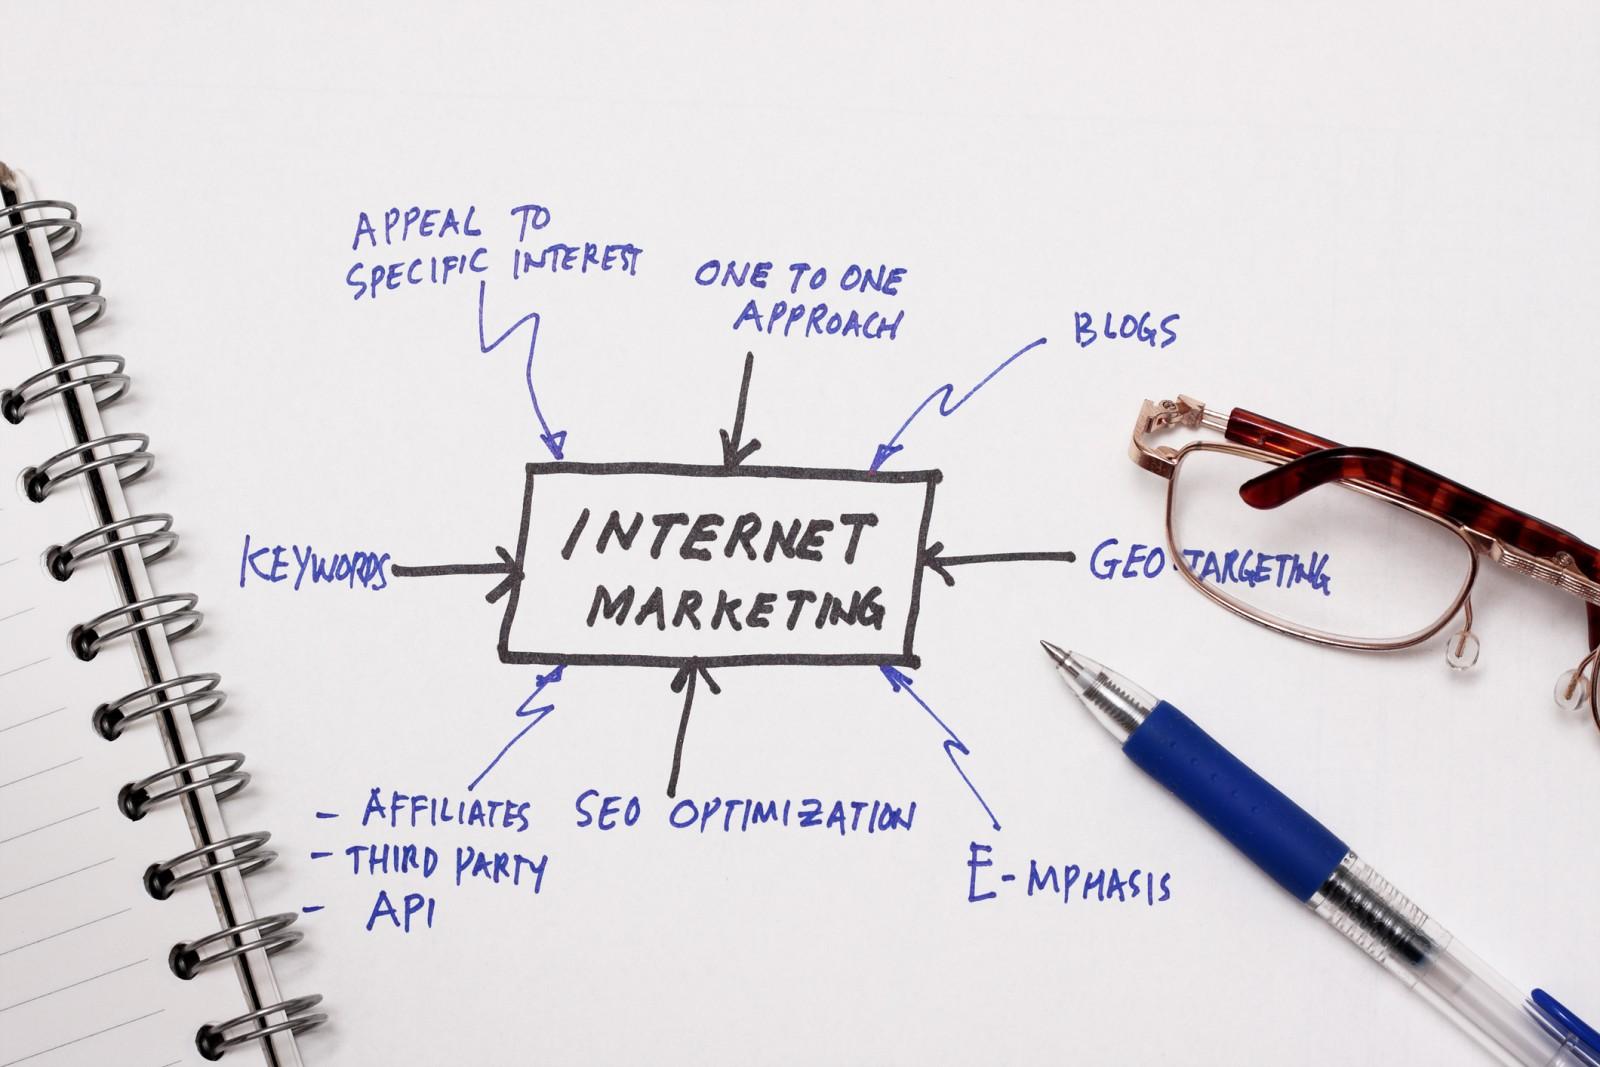 Reach Beyond Limits by Using Digital Marketing Stretegy